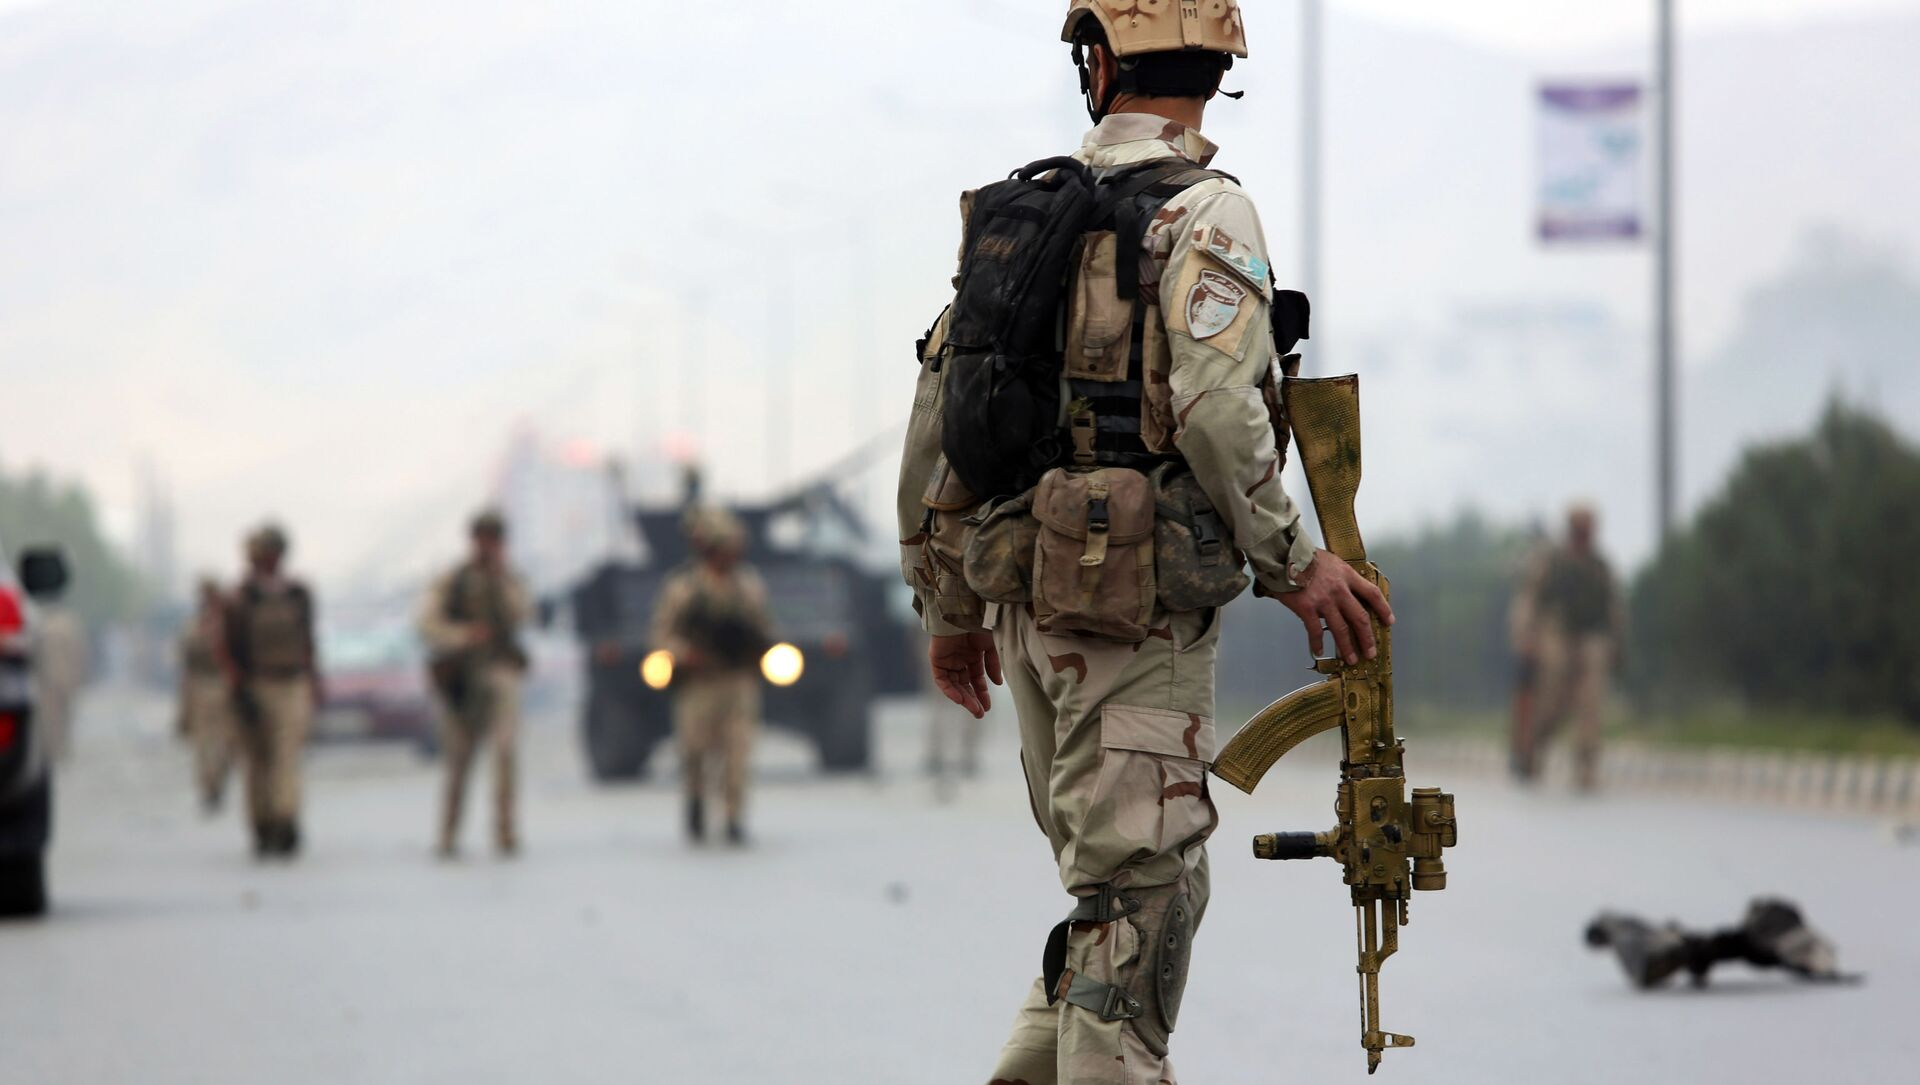 Lực lượng an ninh Afghanistan ở Kabul - Sputnik Việt Nam, 1920, 26.08.2021